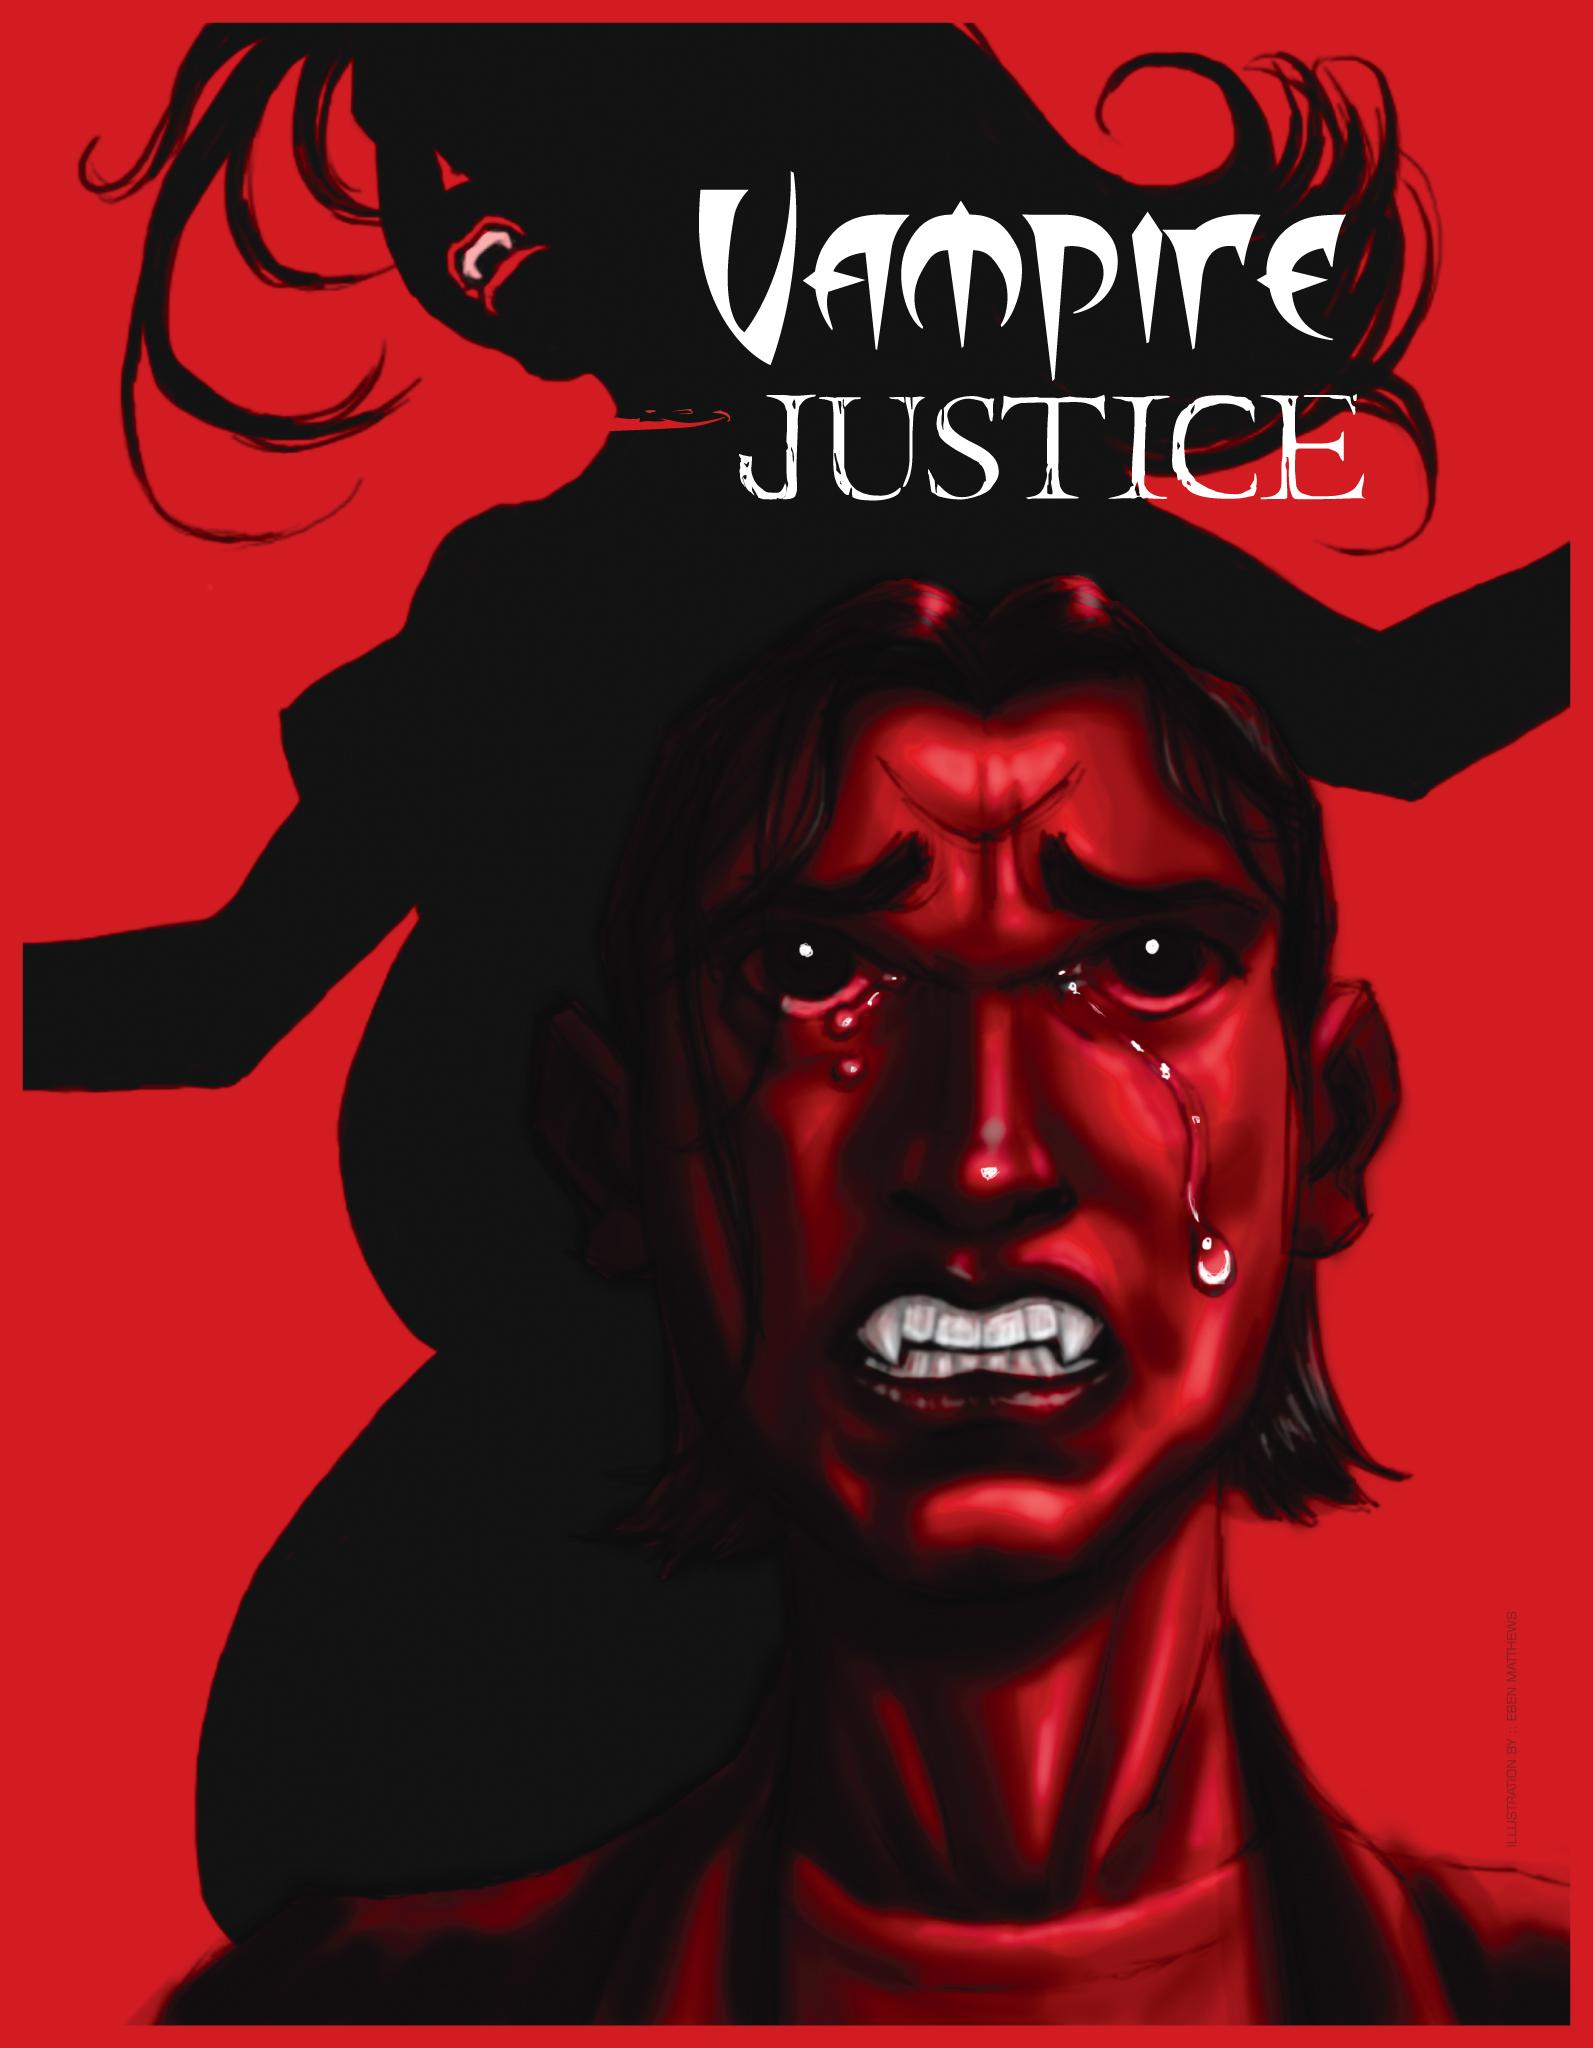 vampirejustice_illus.jpg